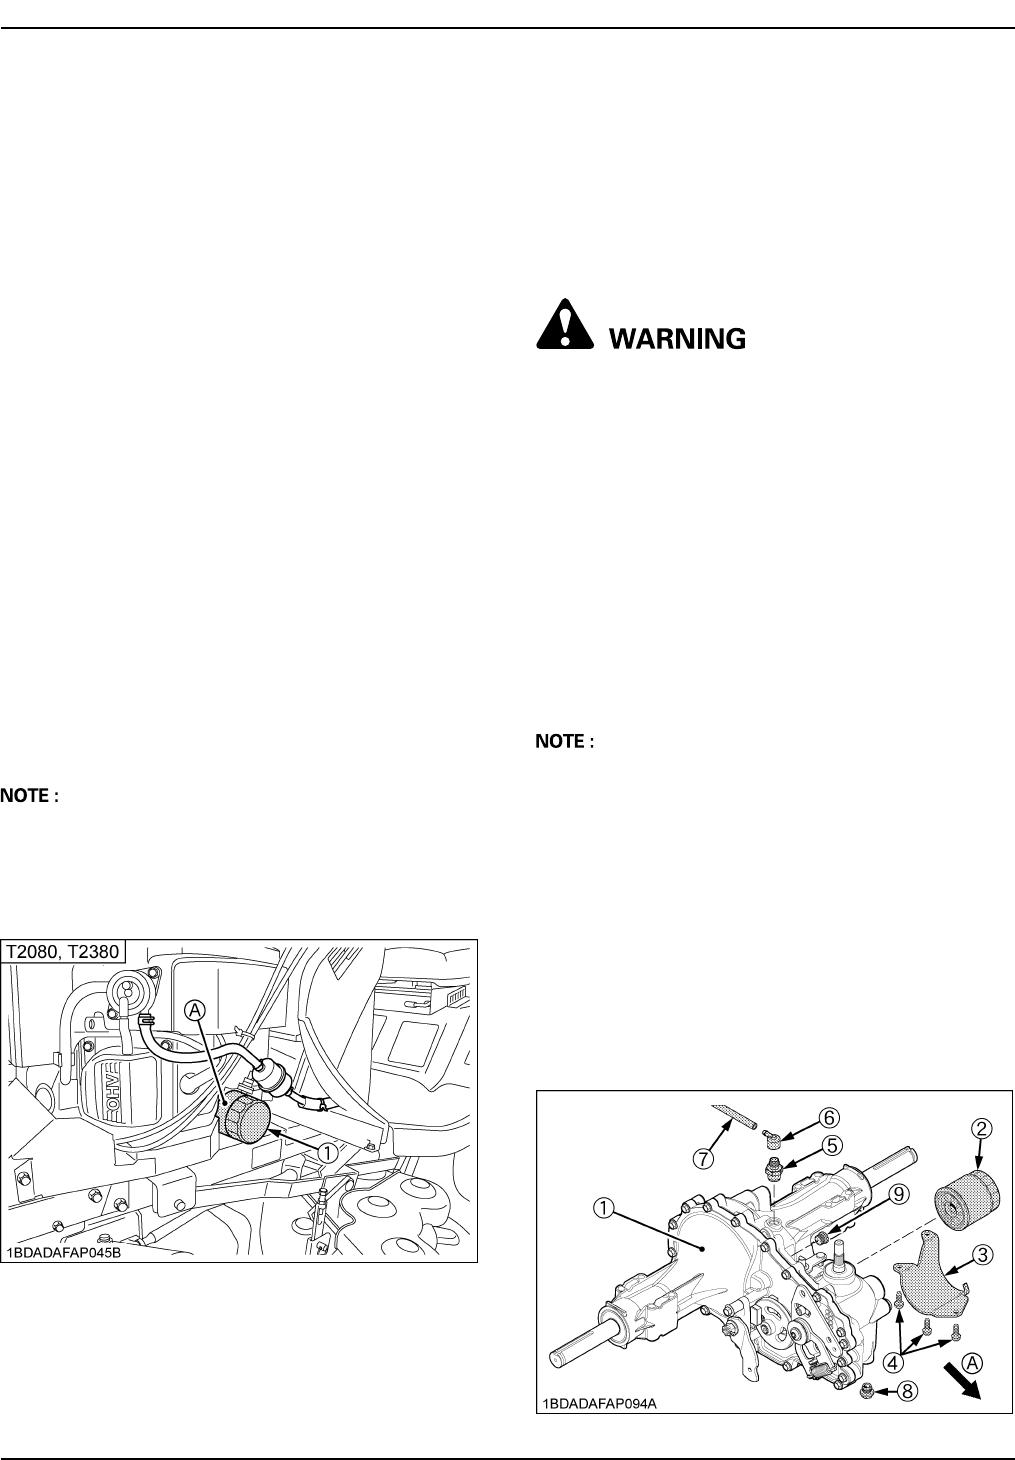 Stupendous Handleiding Kubota T1880 Pagina 67 Van 78 English Wiring 101 Olytiaxxcnl